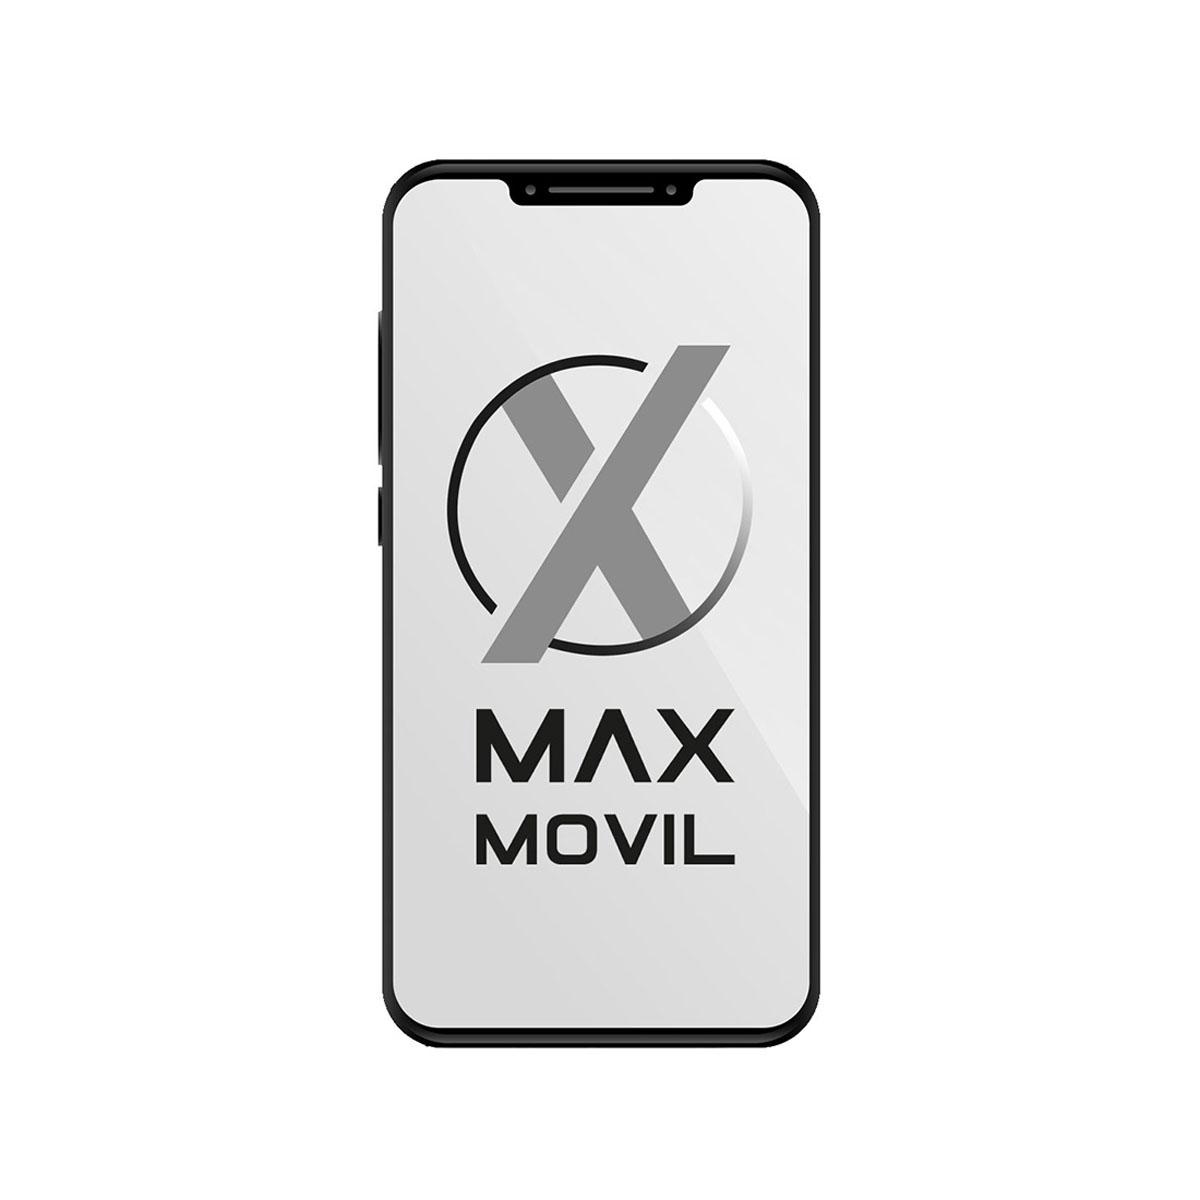 Manos libres vehiculo Bluetooth Parrot MKI9000